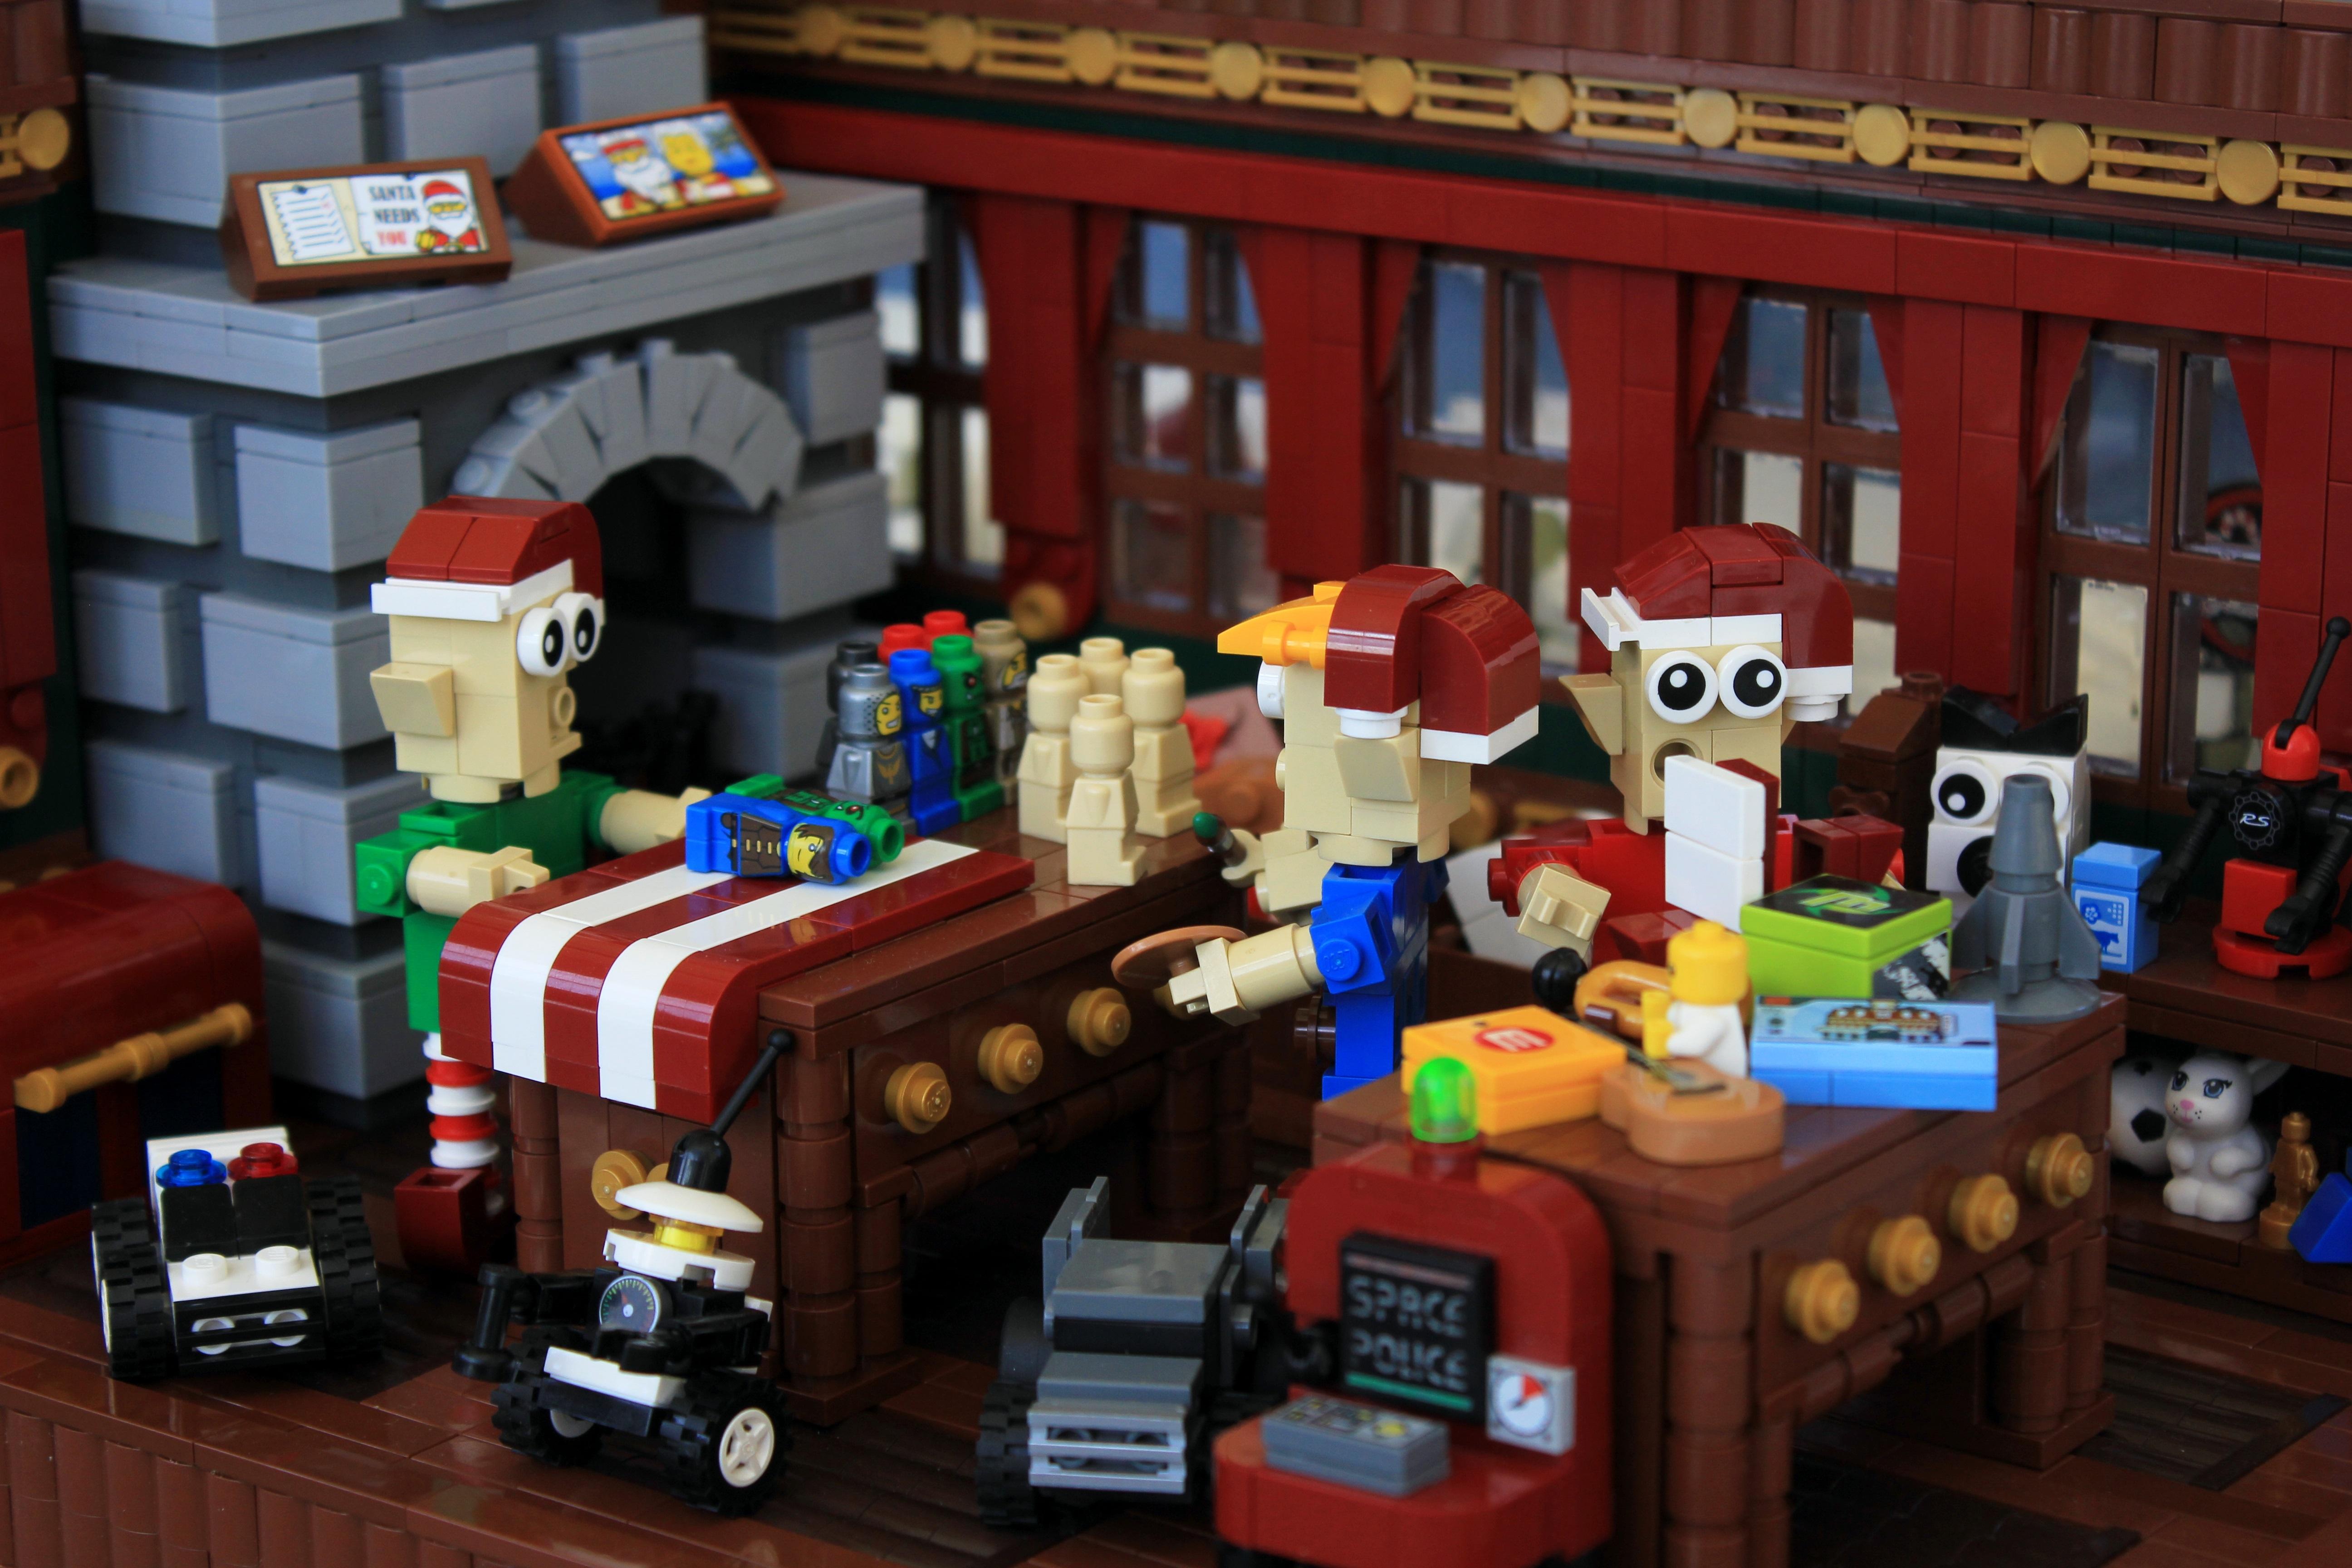 hintergrundbilder modell fenster roboter auto innere mauer tabelle holz haus lego. Black Bedroom Furniture Sets. Home Design Ideas